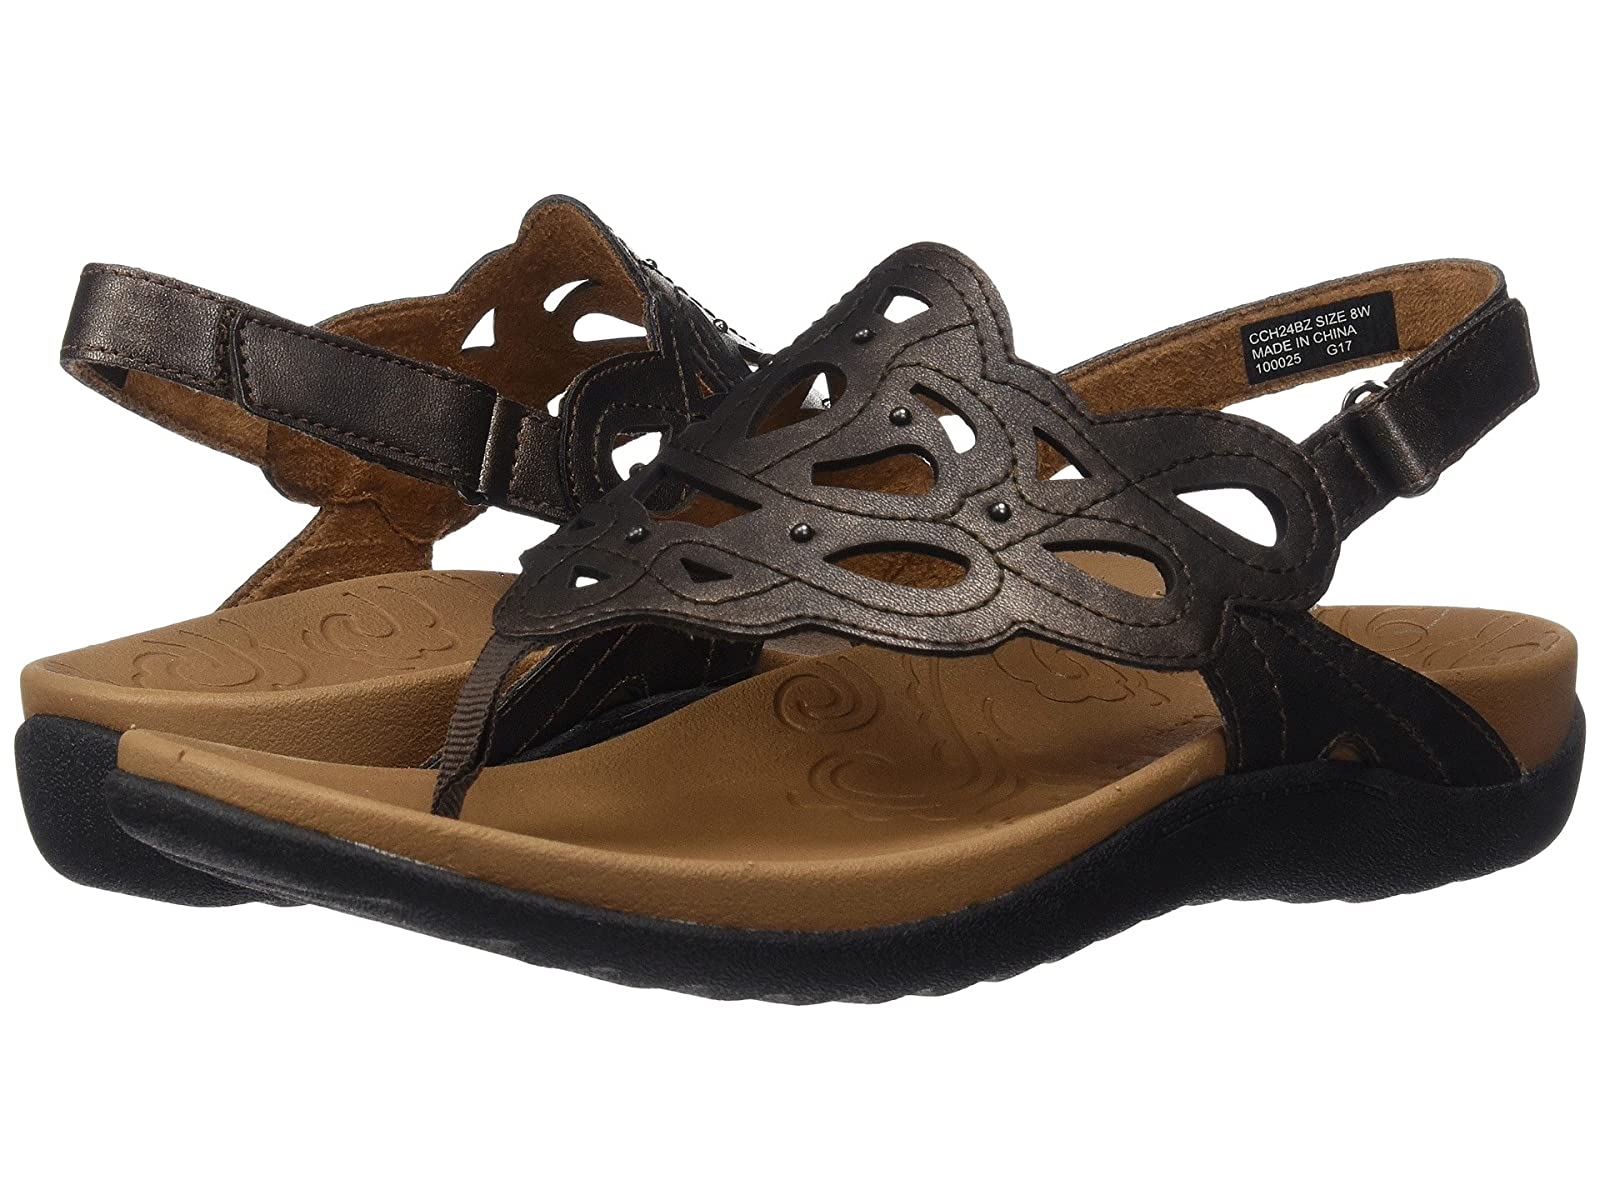 Rockport Ridge SlingCheap and distinctive eye-catching shoes